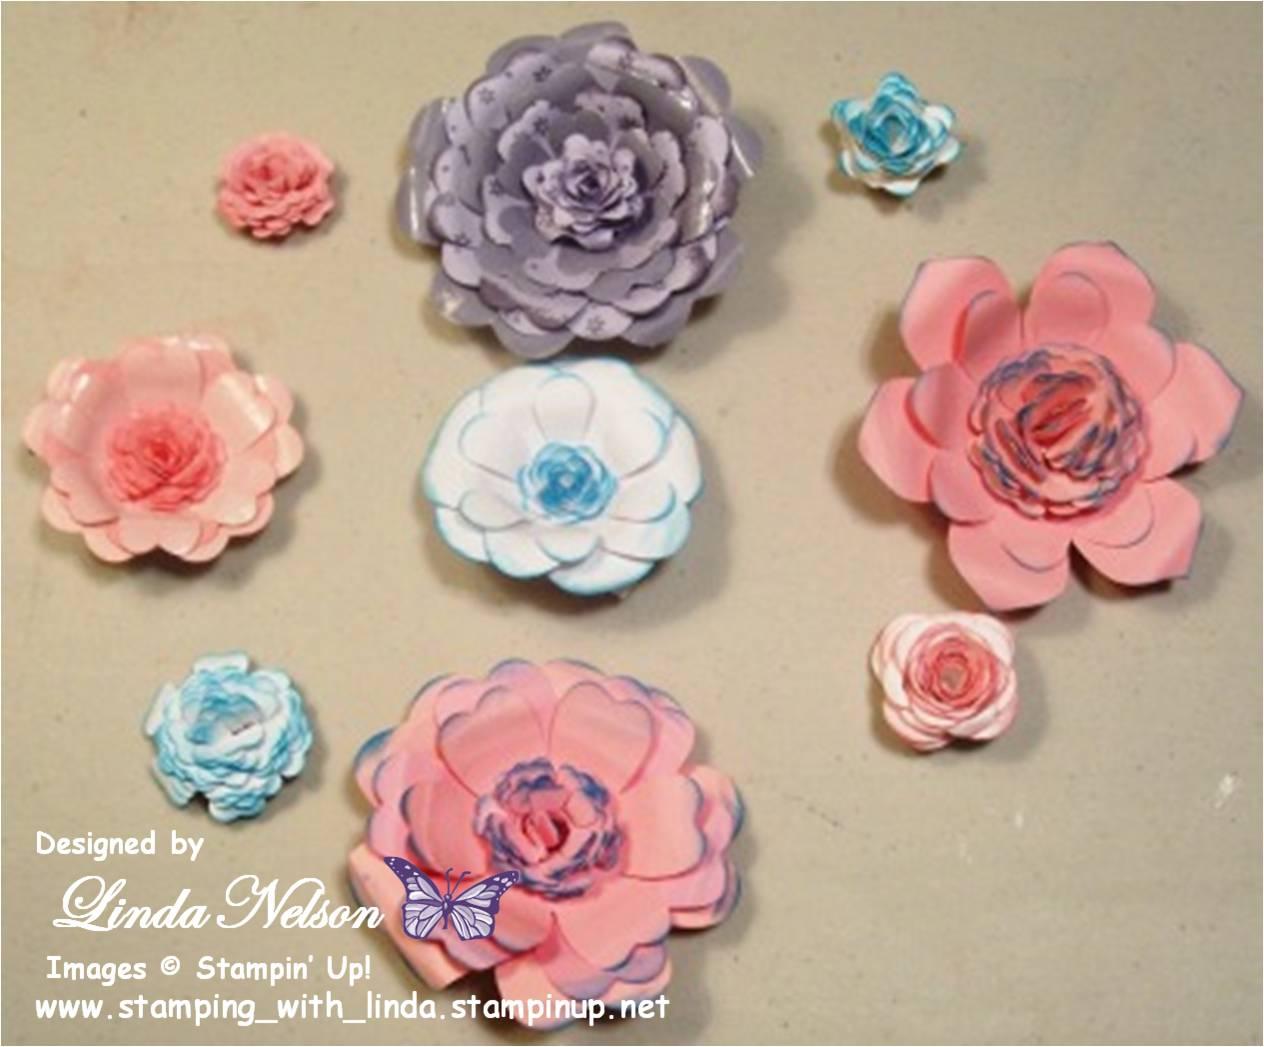 http://4.bp.blogspot.com/-4vxCcTxE6io/UVkaUdOQ-iI/AAAAAAAABys/TH1TEkz9aHY/s1600/Cricut+Paper+Flowers+with+wim.jpg